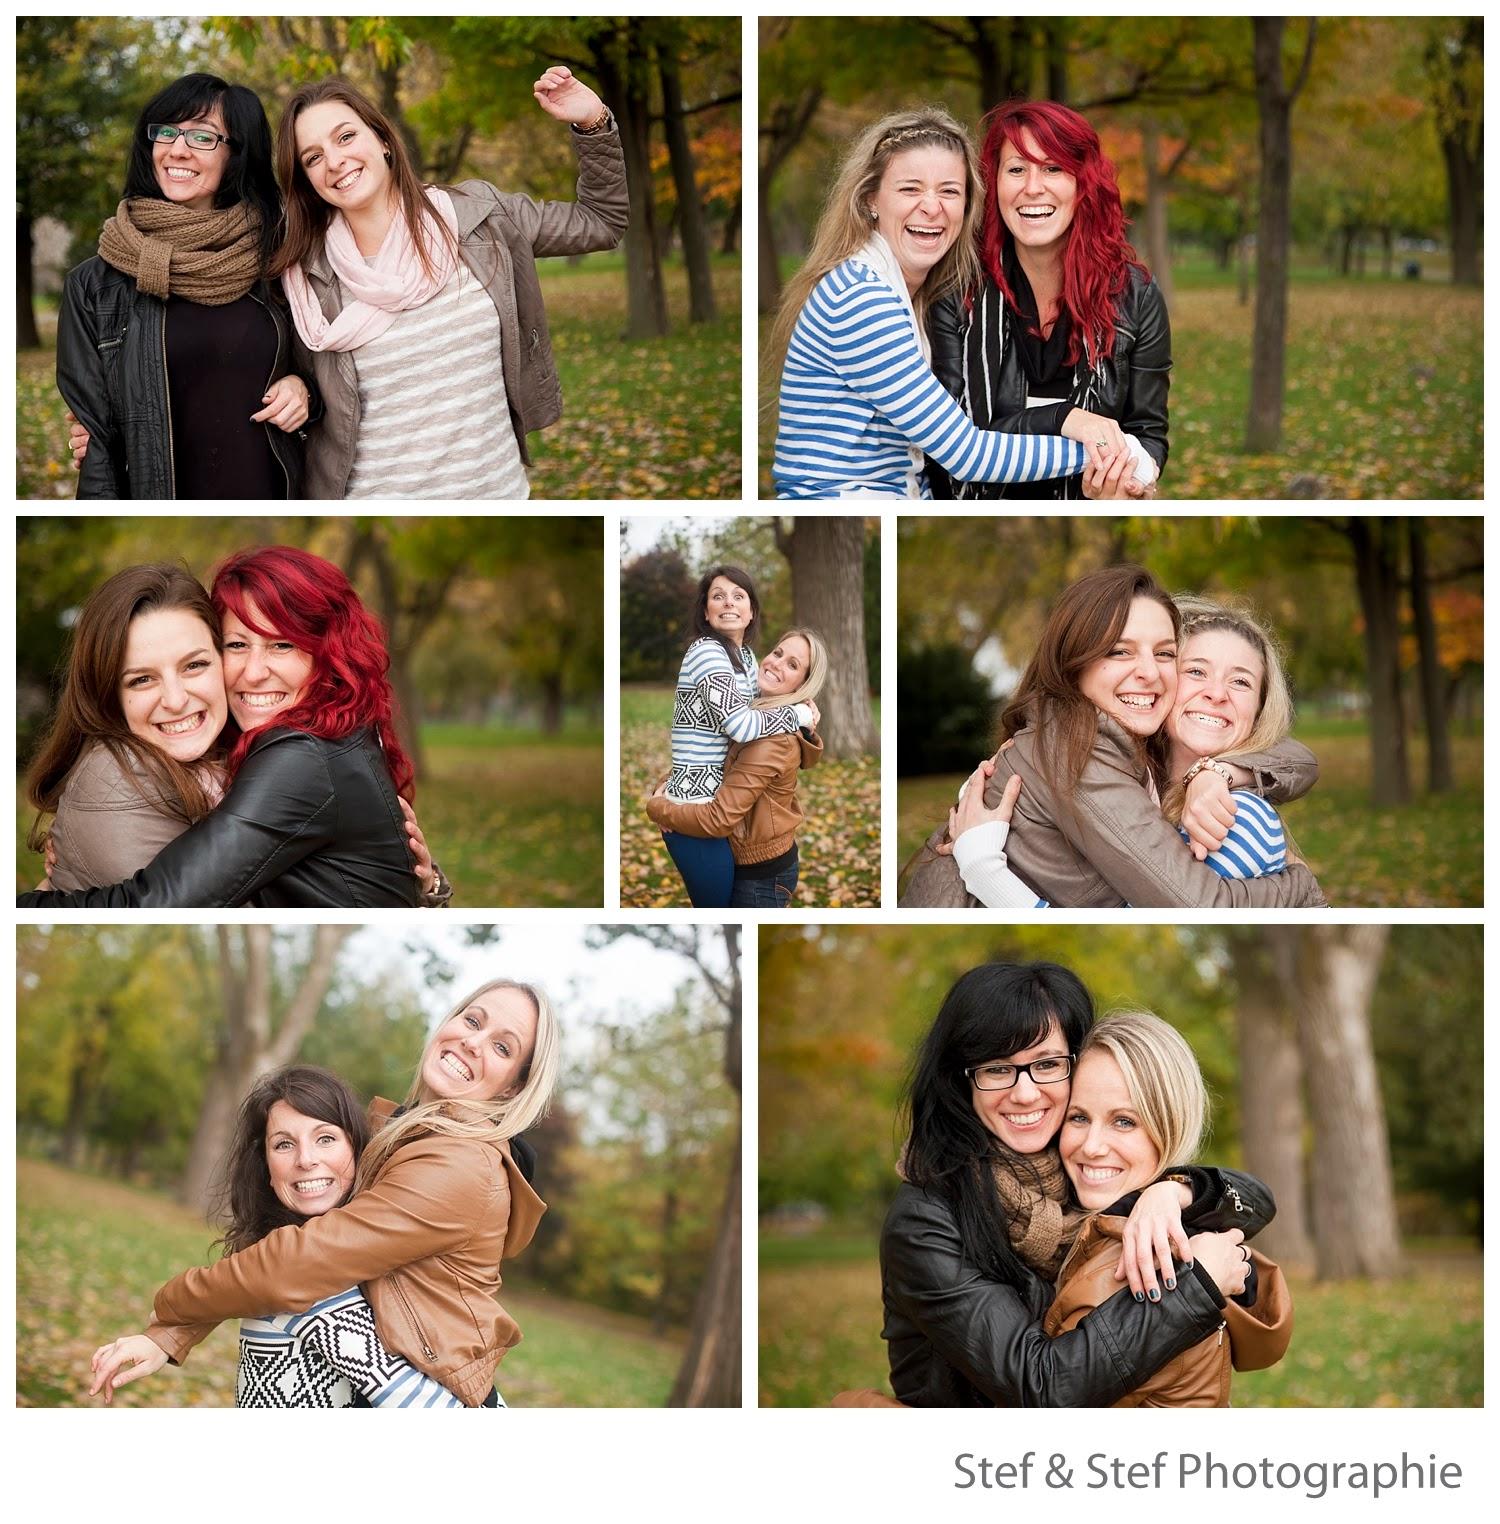 portrait photographer montreal